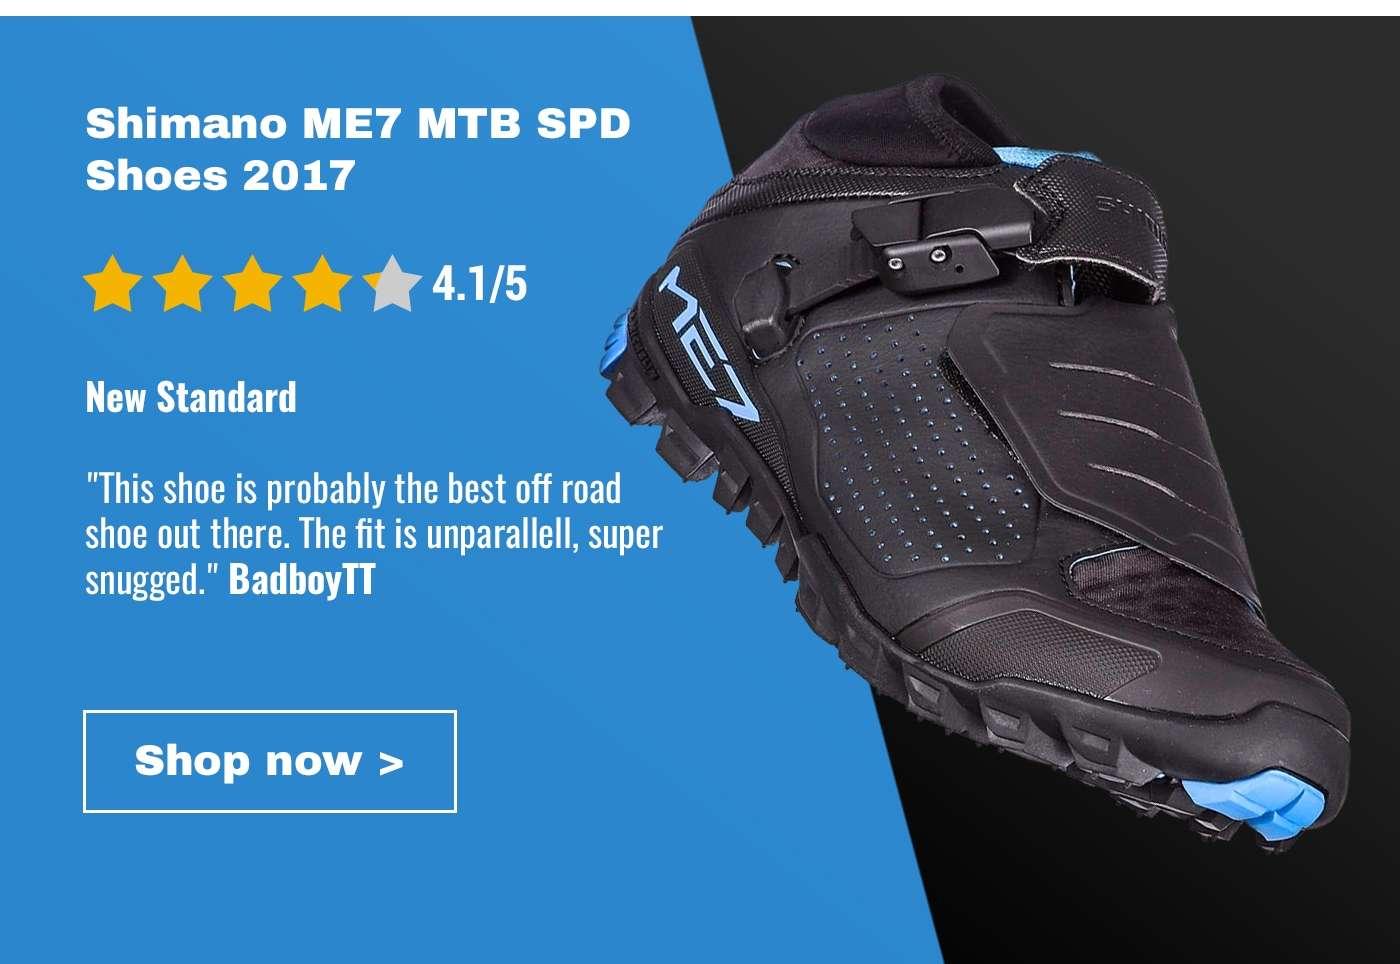 Shimano ME7 MTB SPD Shoes 2017